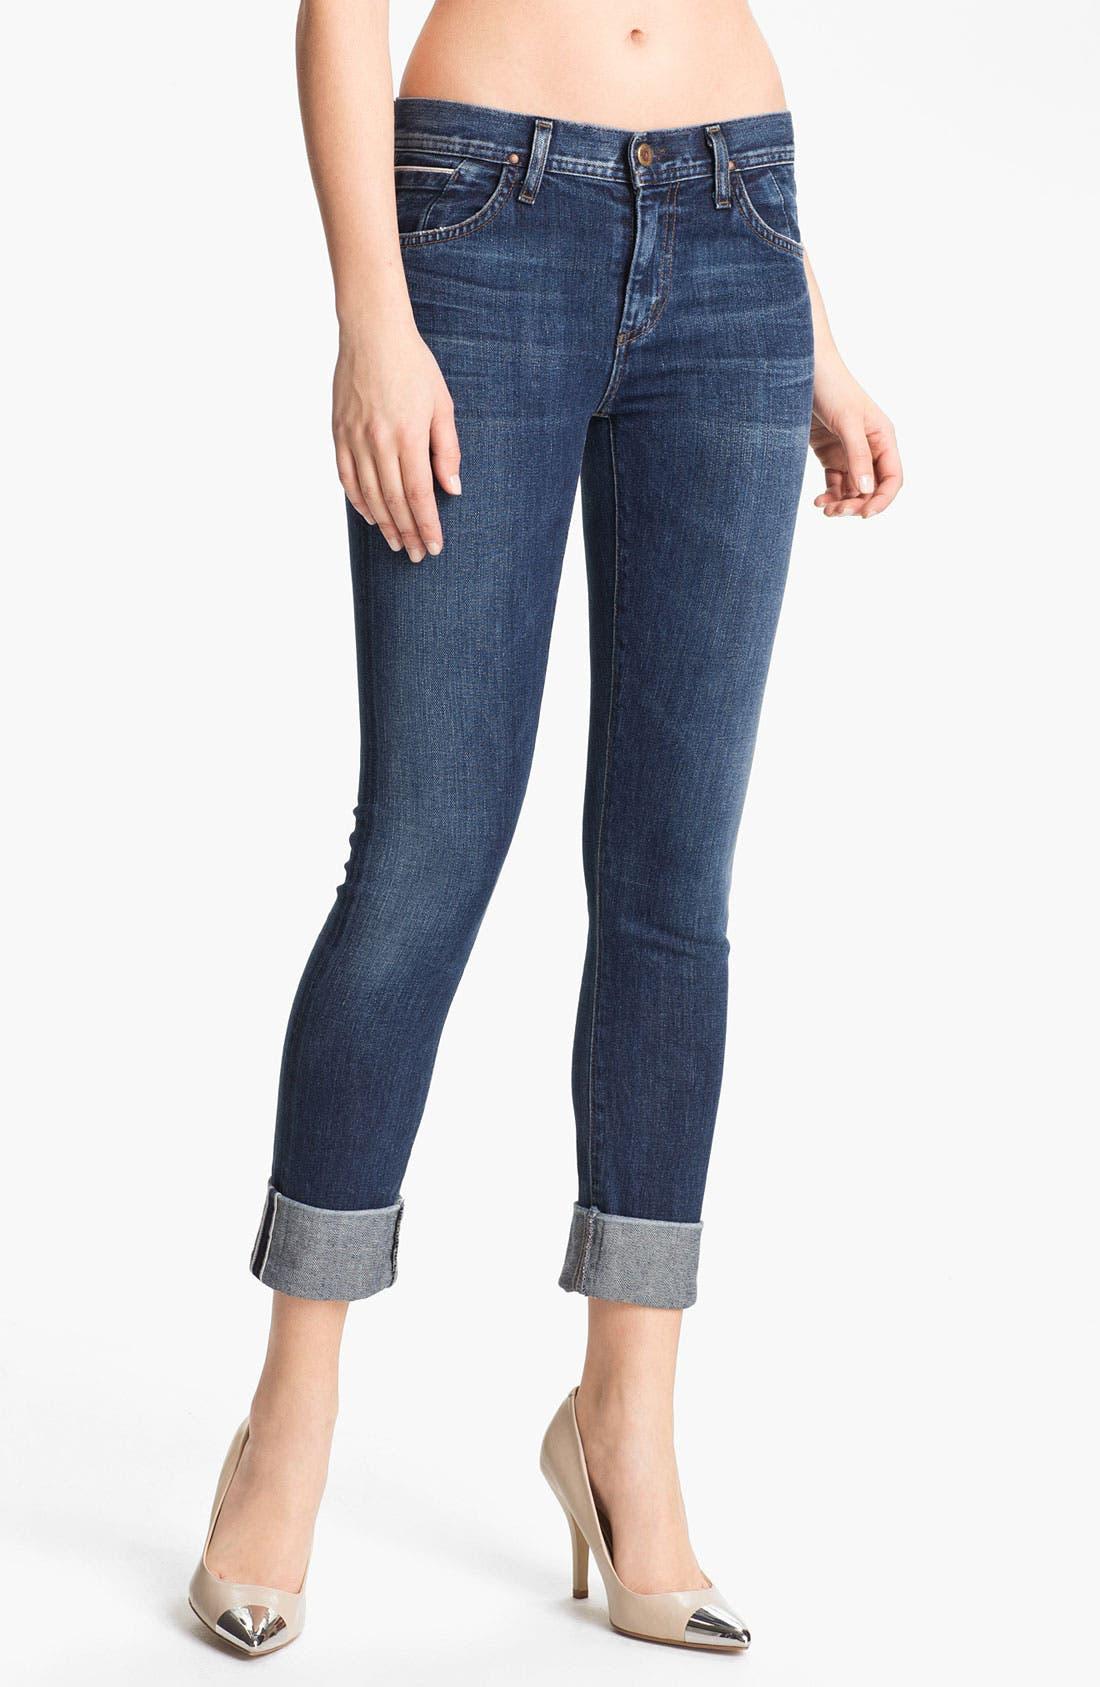 Alternate Image 1 Selected - Goldsign 'Jenny' High Waist Crop Skinny Jeans (Debut)